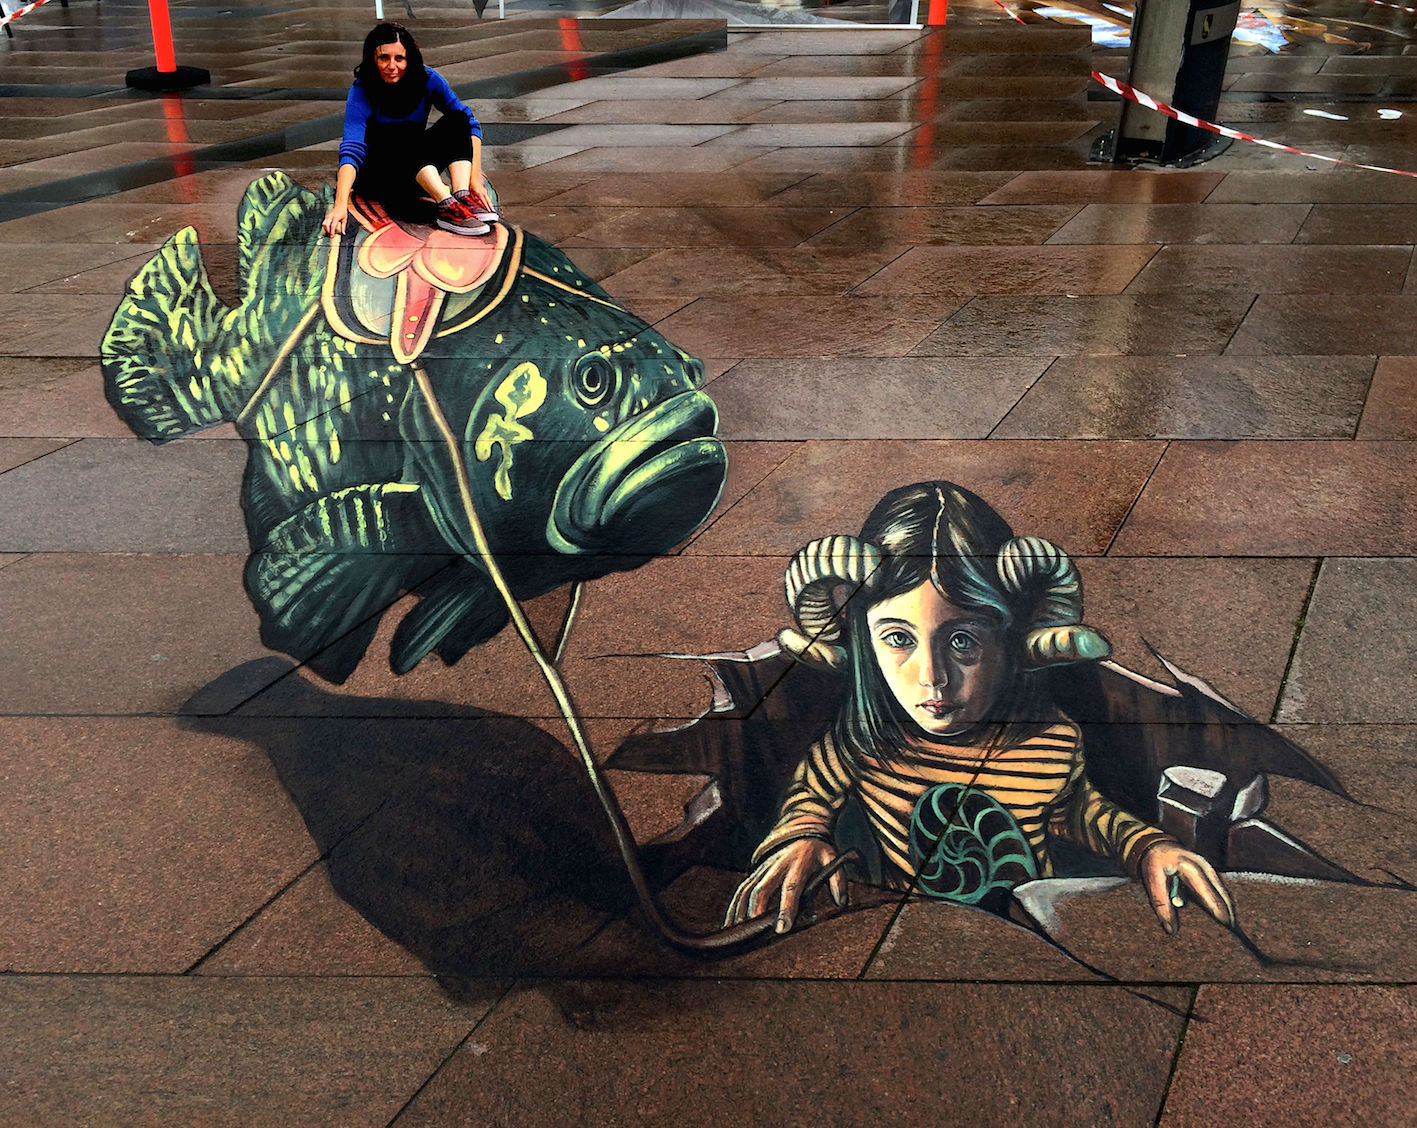 verabugatti streetart brande streetartbrande floatingfish flyingfish ridingfish ariete steampunk denmarkarteurbana illusioniottiche 3Dstreetart anamorfosi anamorfico anamorphic illusions urbanart madonnari3D pavementart 3Dstreetart 3Dstreetpainting environment thereisnotplanetb